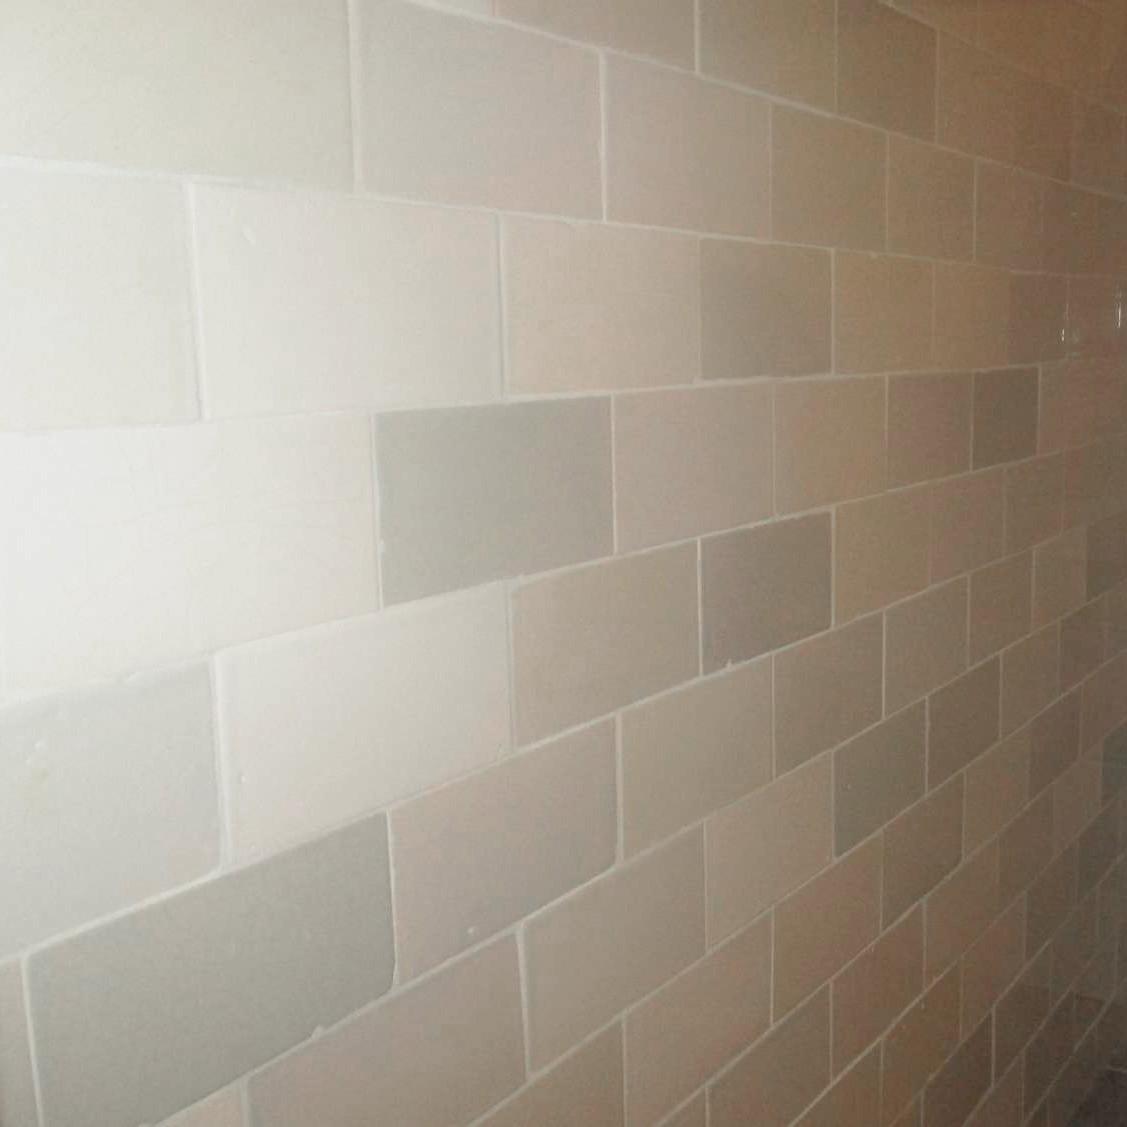 Handmade industrial wall tiles